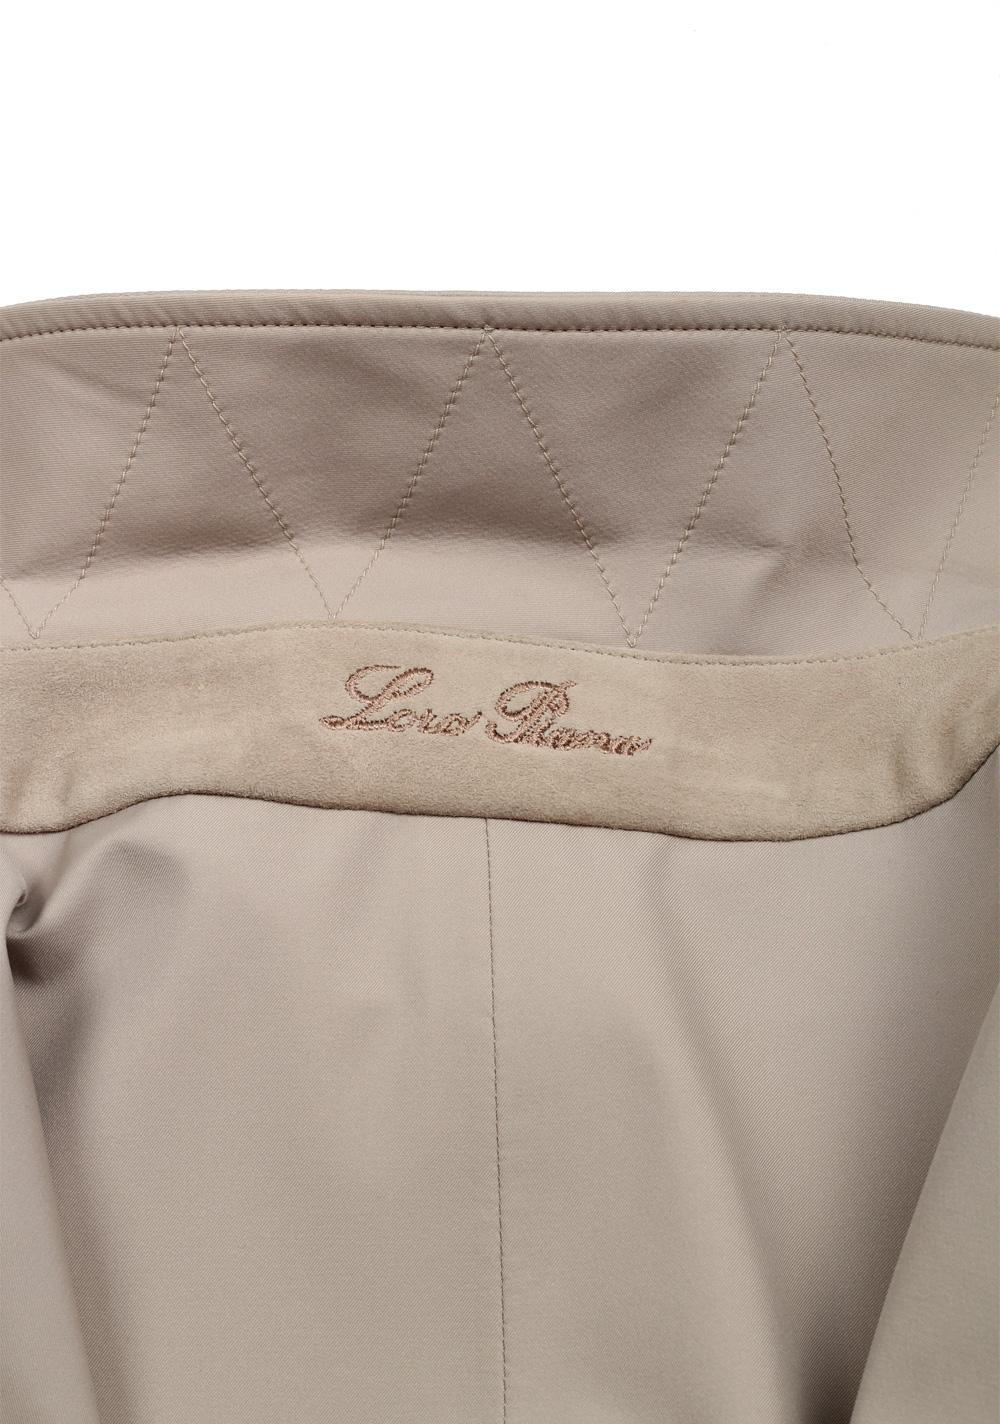 Loro Piana Beige Delaware Rain Coat Size Xxl Outerwear   Costume Limité